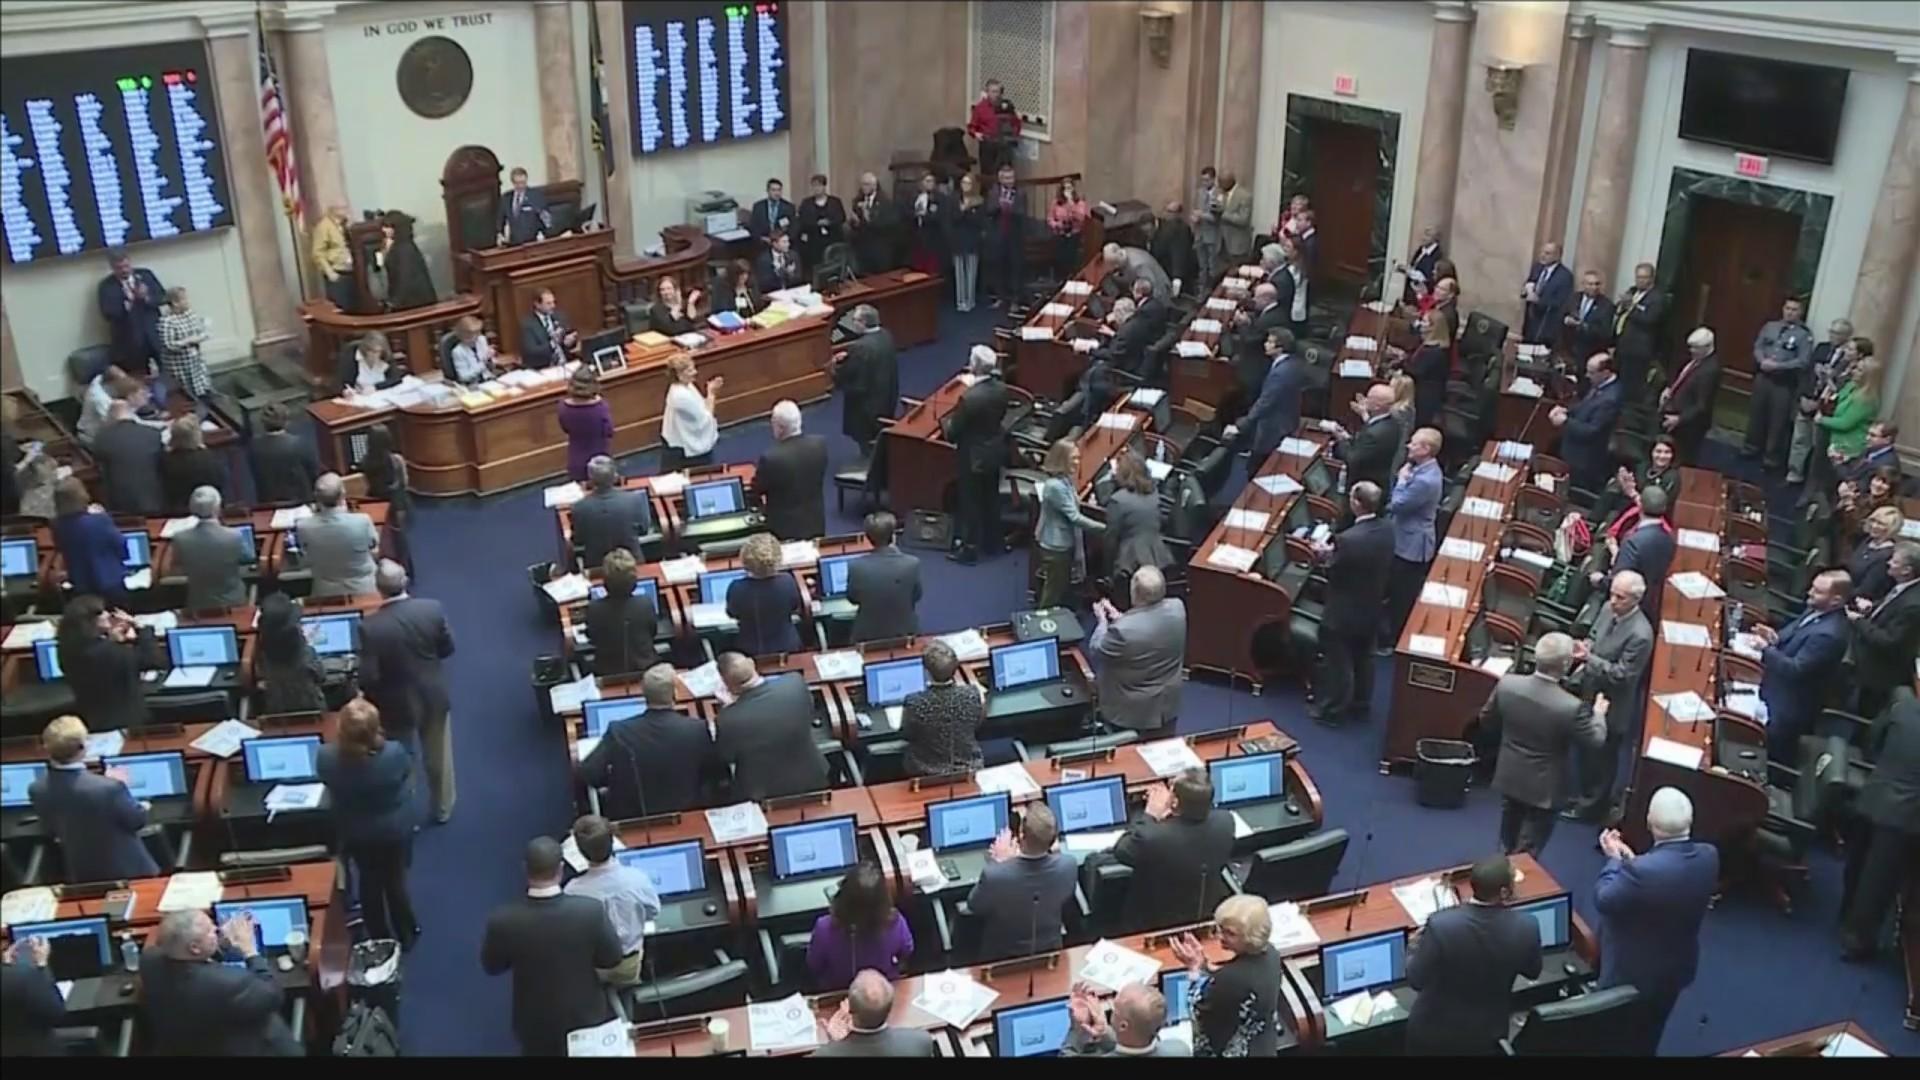 More_women_in_Kentucky_legislature_than__0_20190109035542